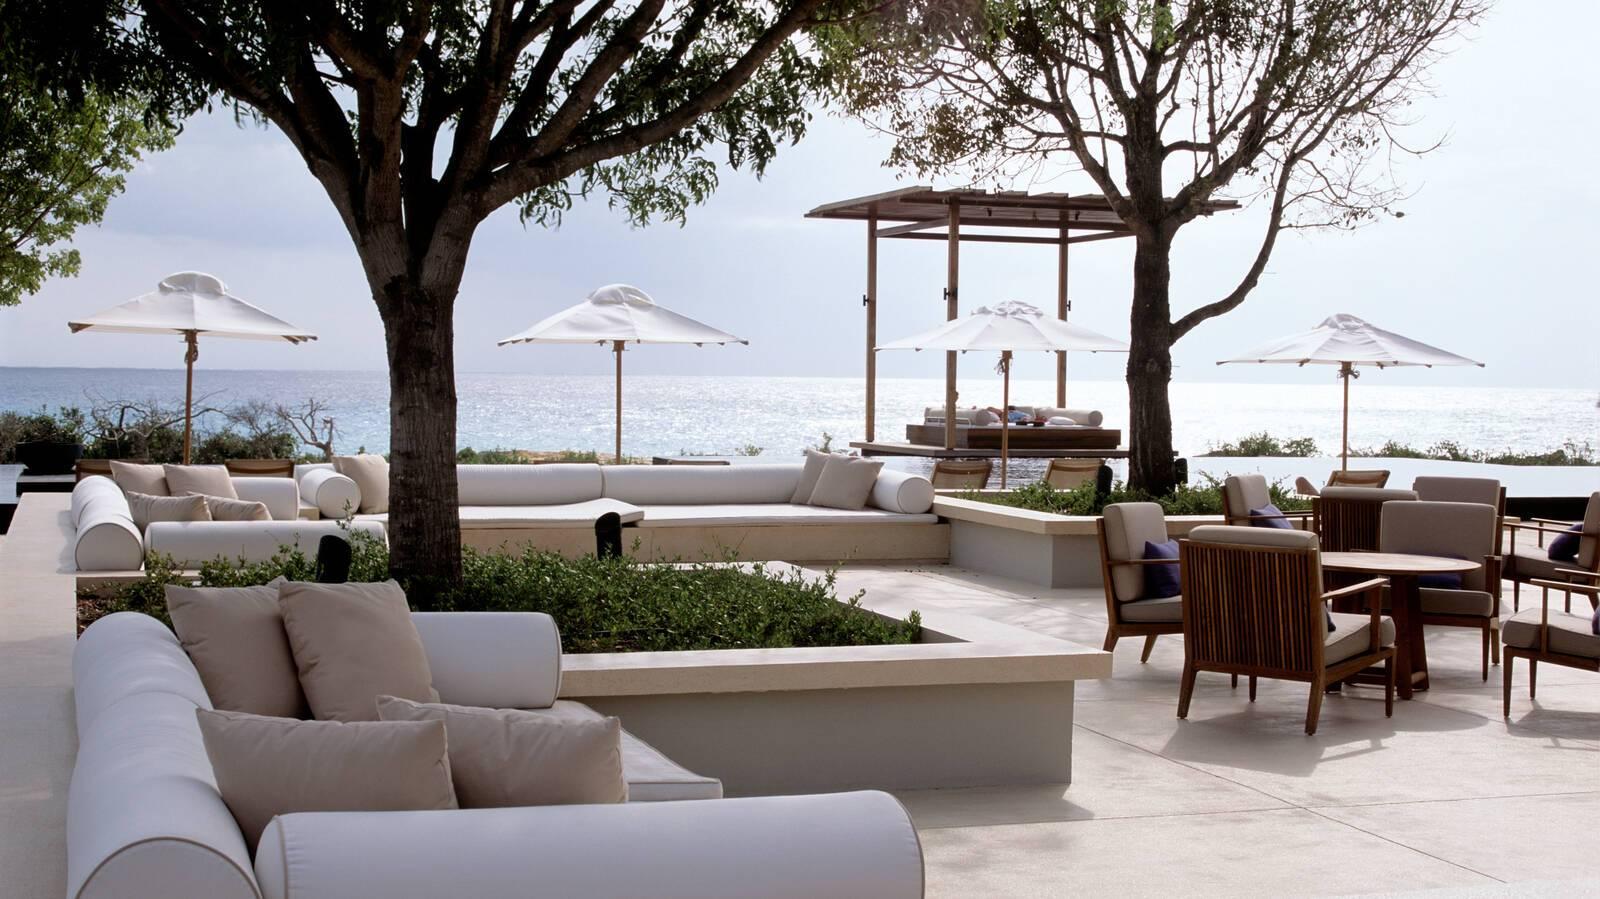 Amanyara Terrasse Turks et Caicos